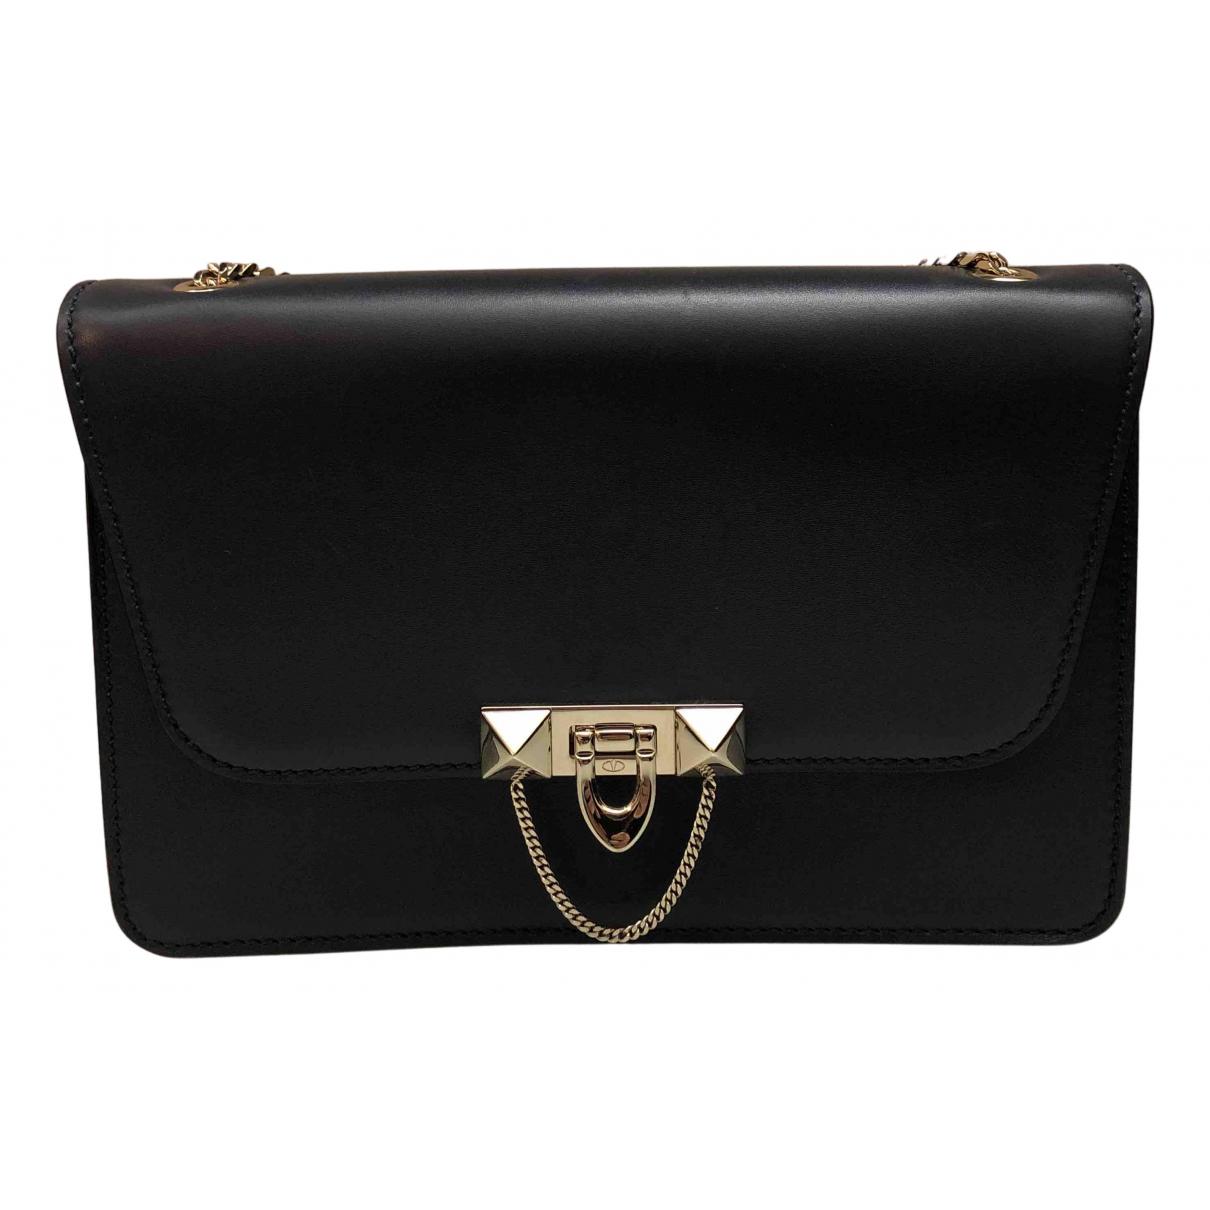 Valentino Garavani Rockstud Blue Leather Clutch bag for Women N